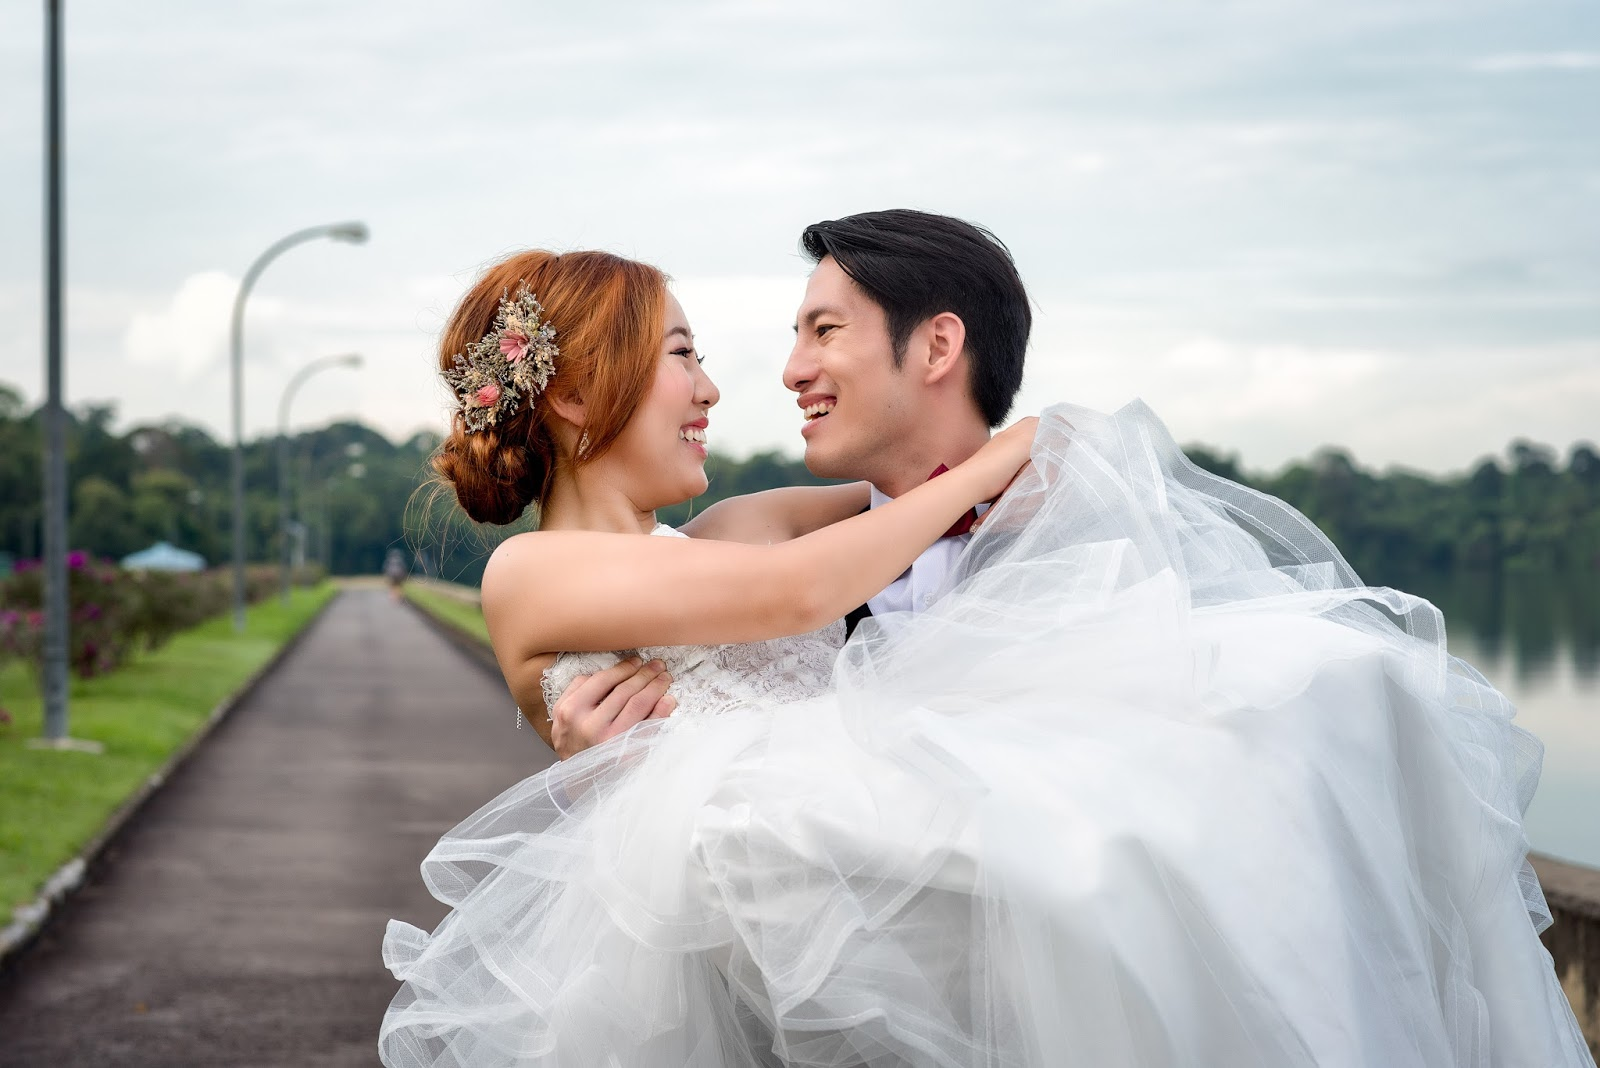 Wedding Dress Korea 95 Amazing Photo by Cepheus Chan